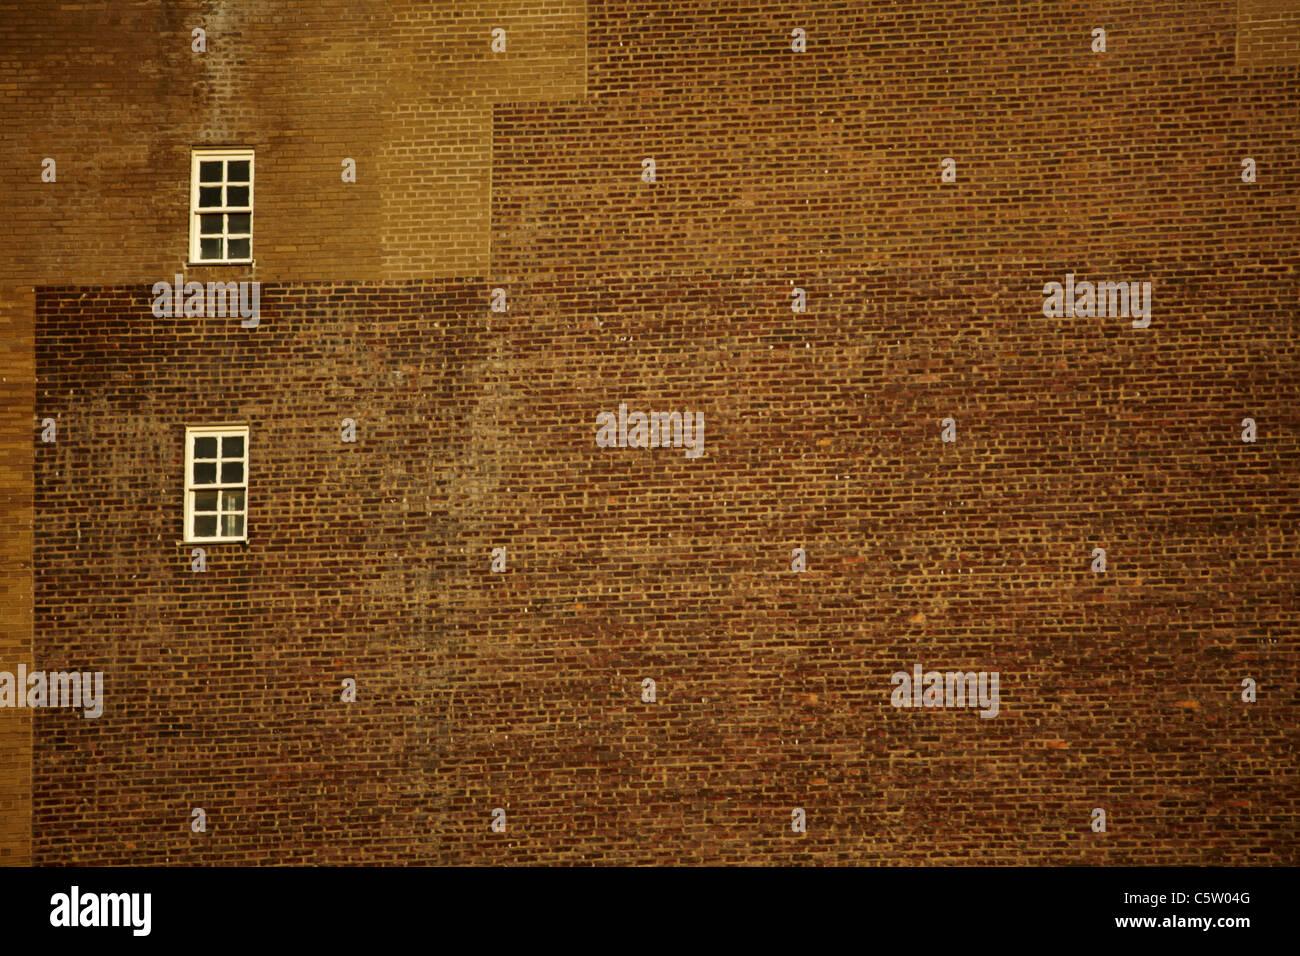 USA, New York, Manhattan, Brick wall, full frame - Stock Image